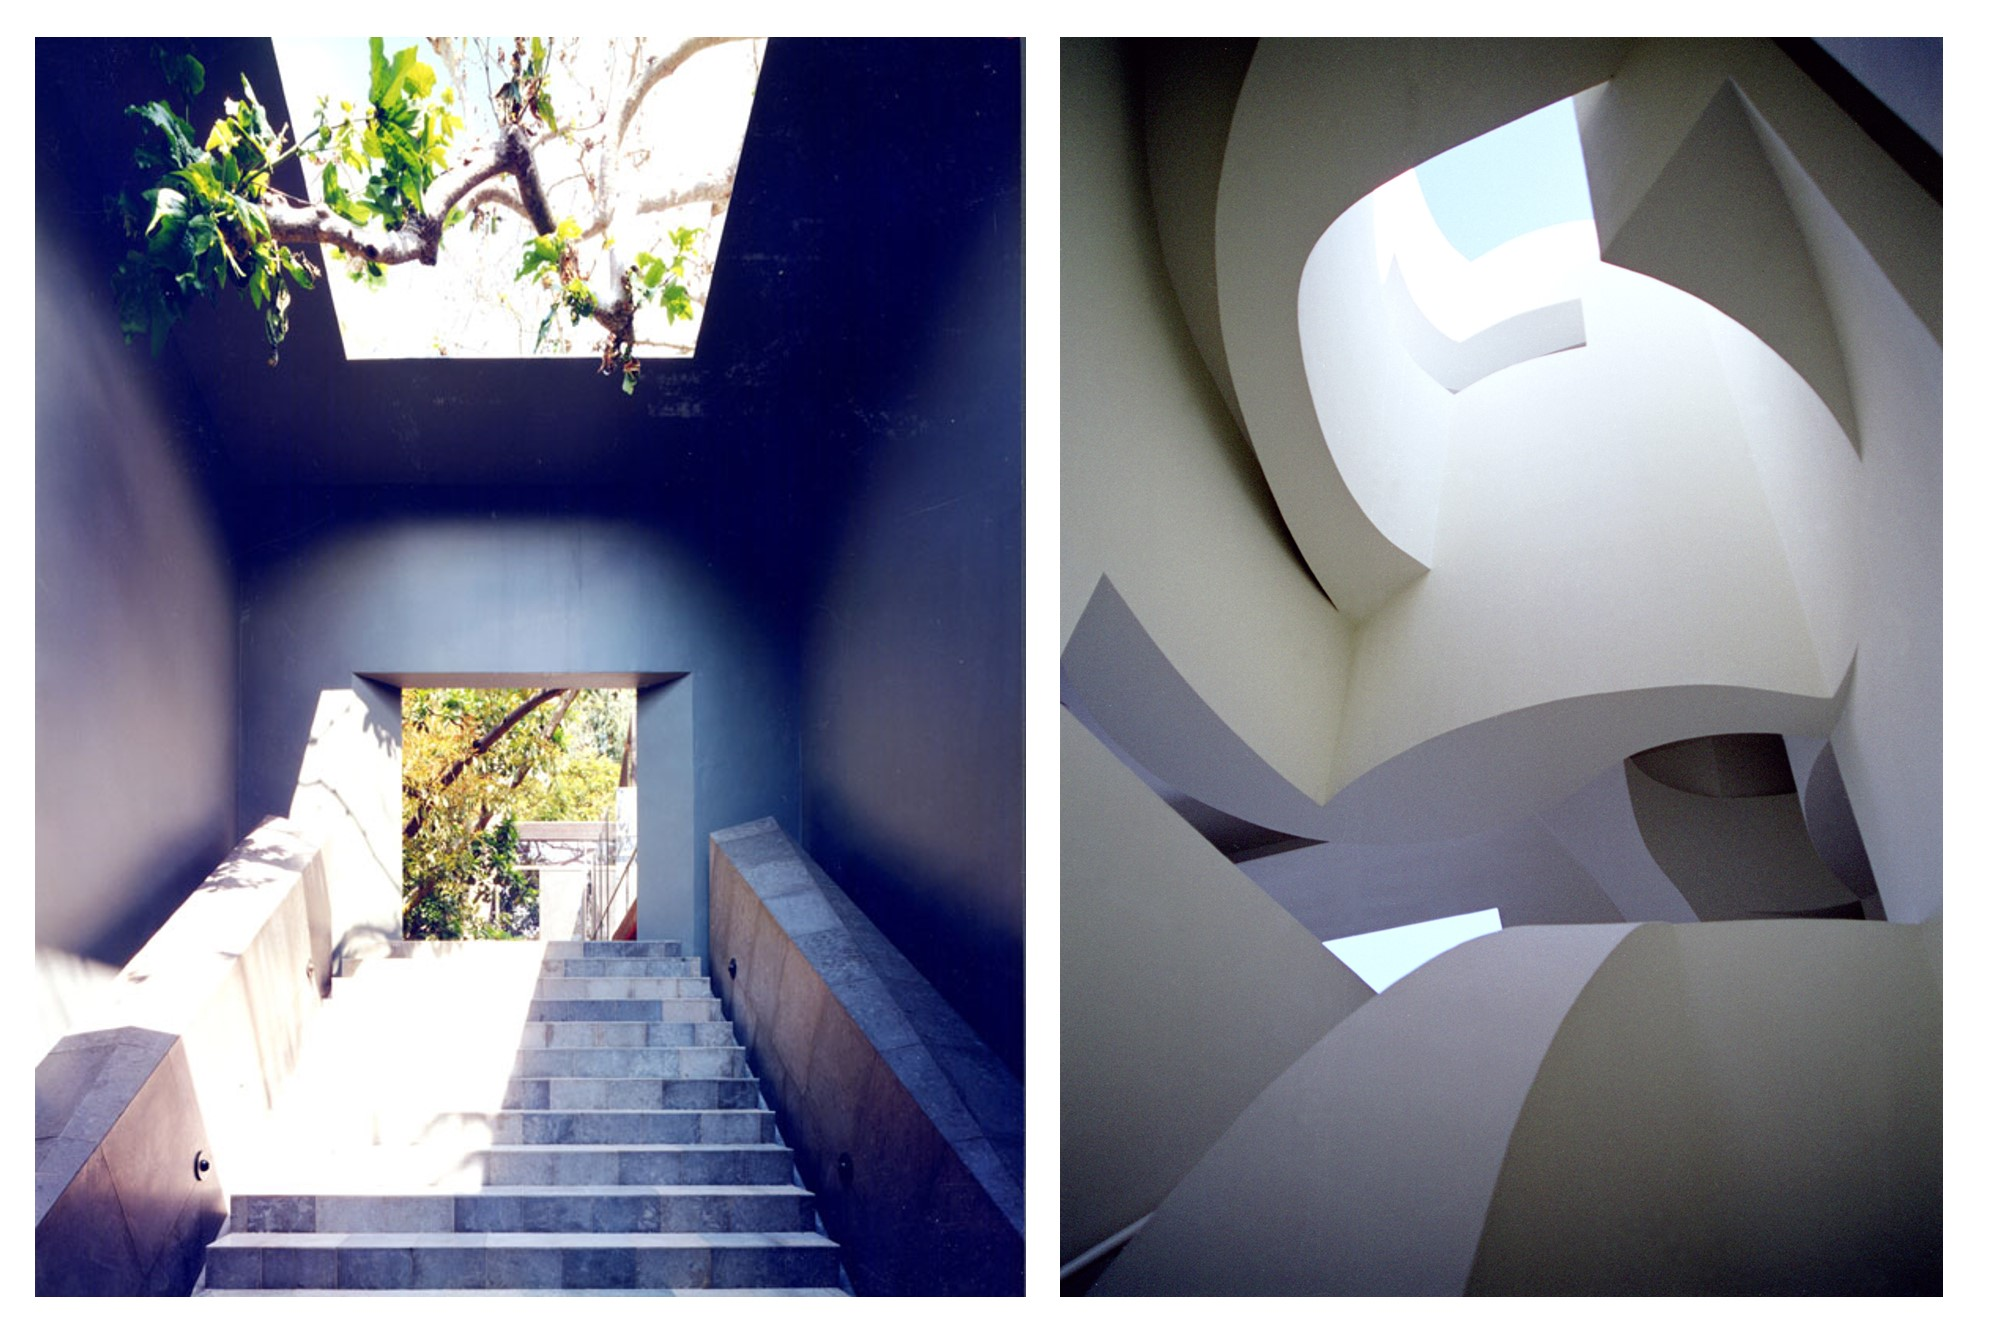 TREE HOUSE AND CAVE (Santa Monica gallery left; Pasadena Museum of California Art, right)